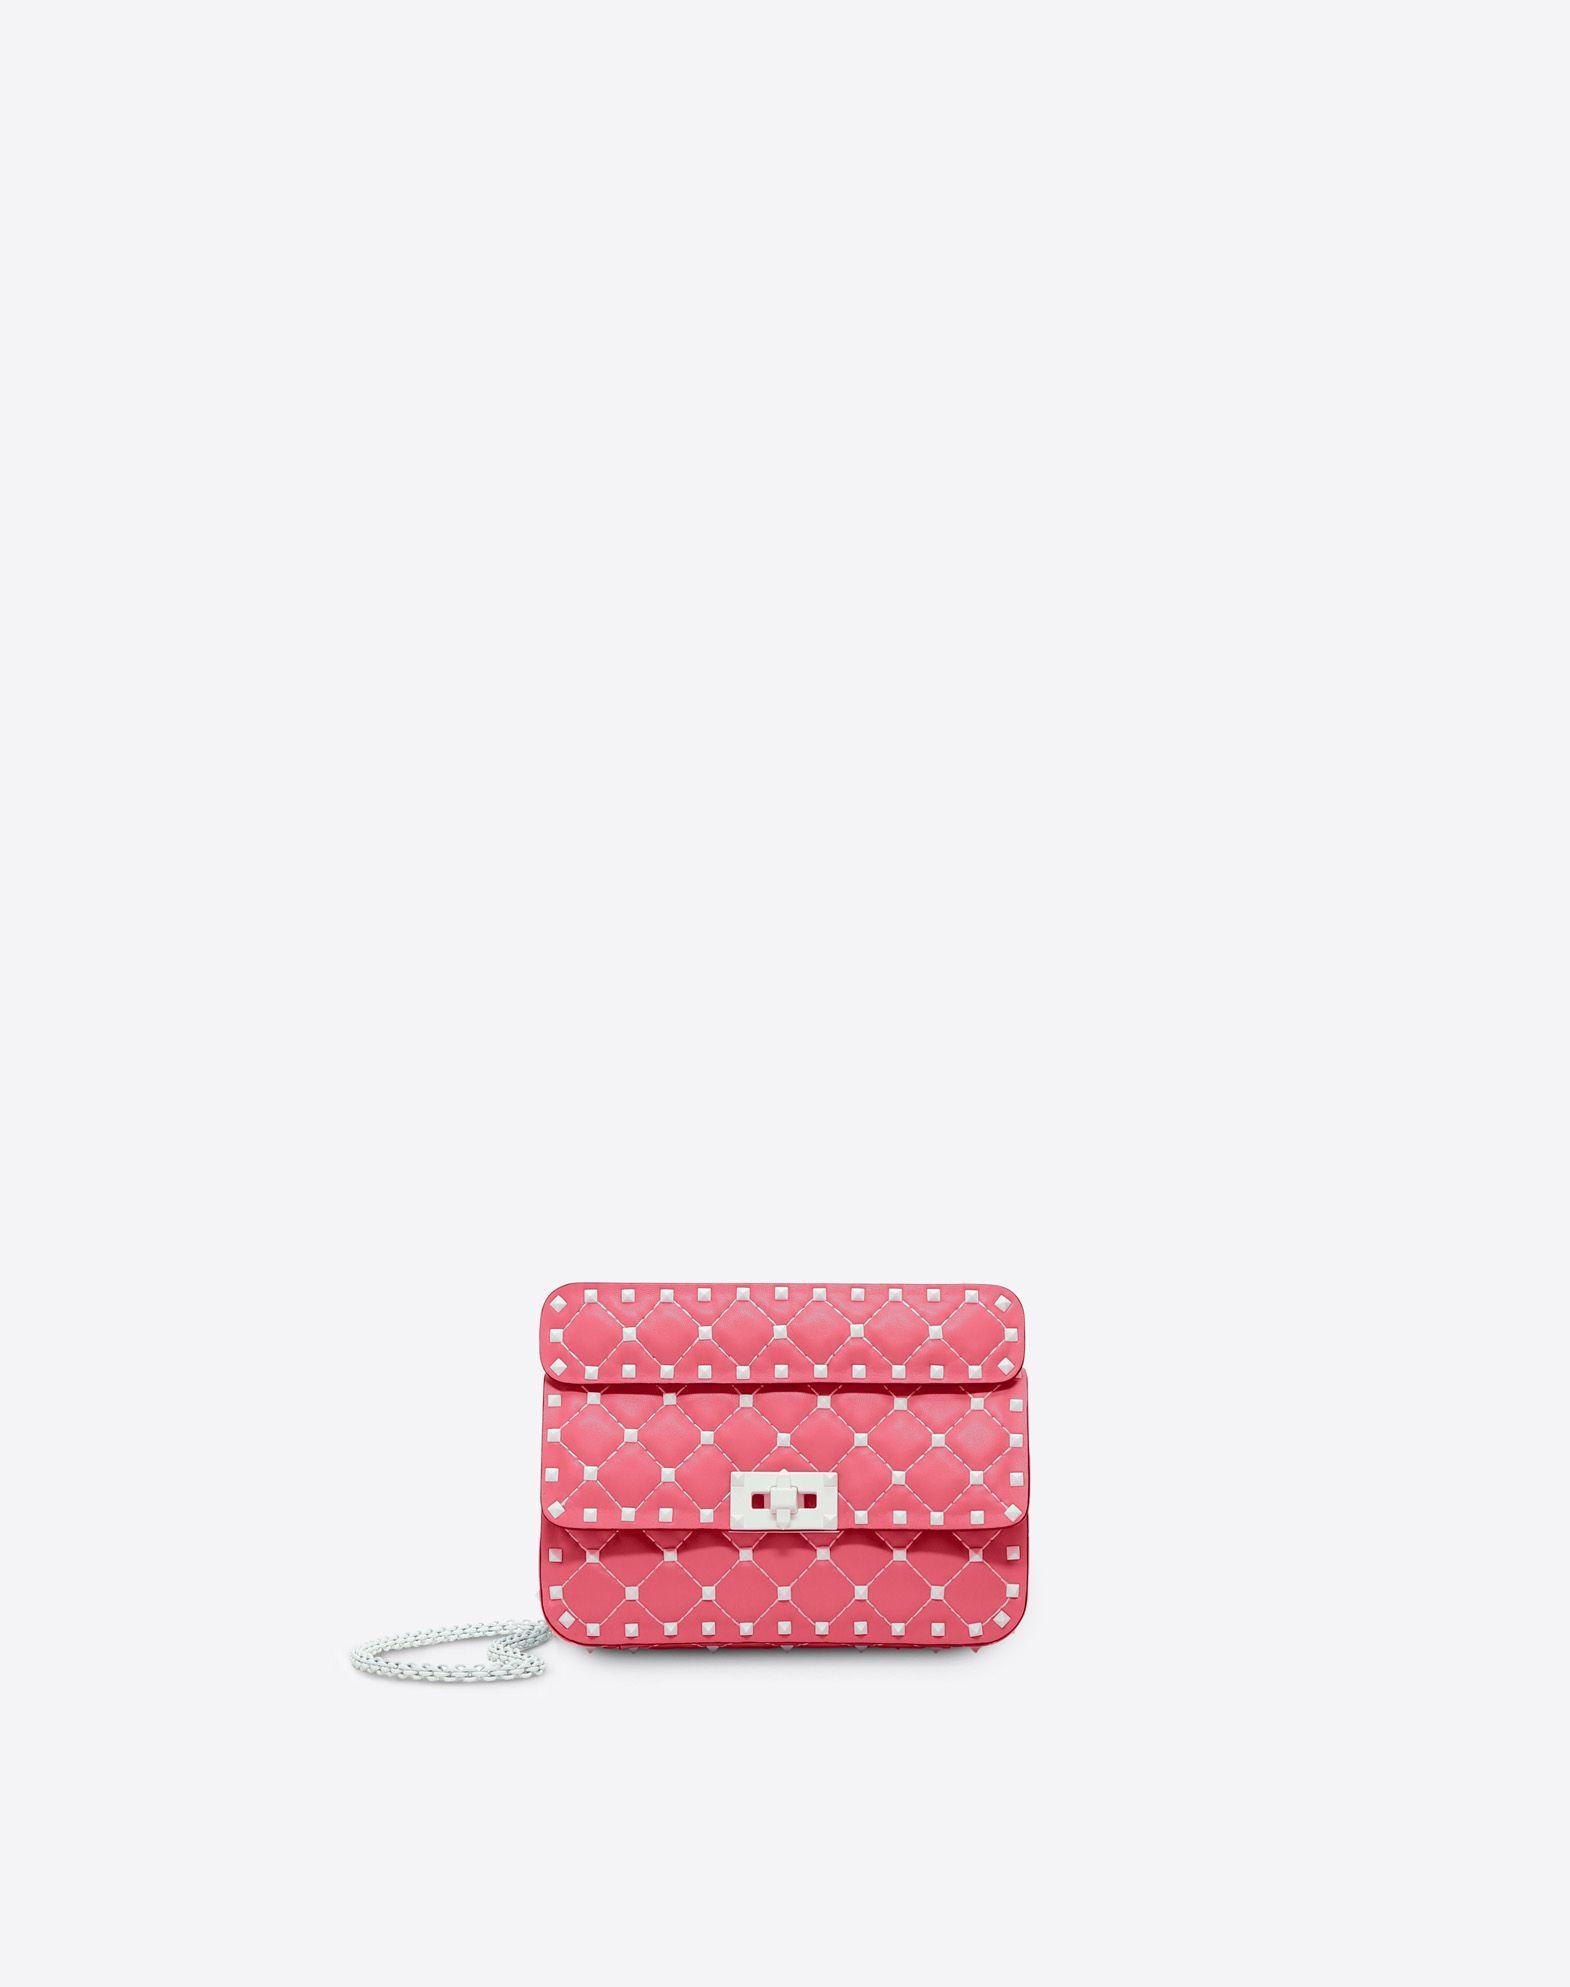 Valentino Garavani Free Rockstud Spike Small Chain Bag In Bright Pink